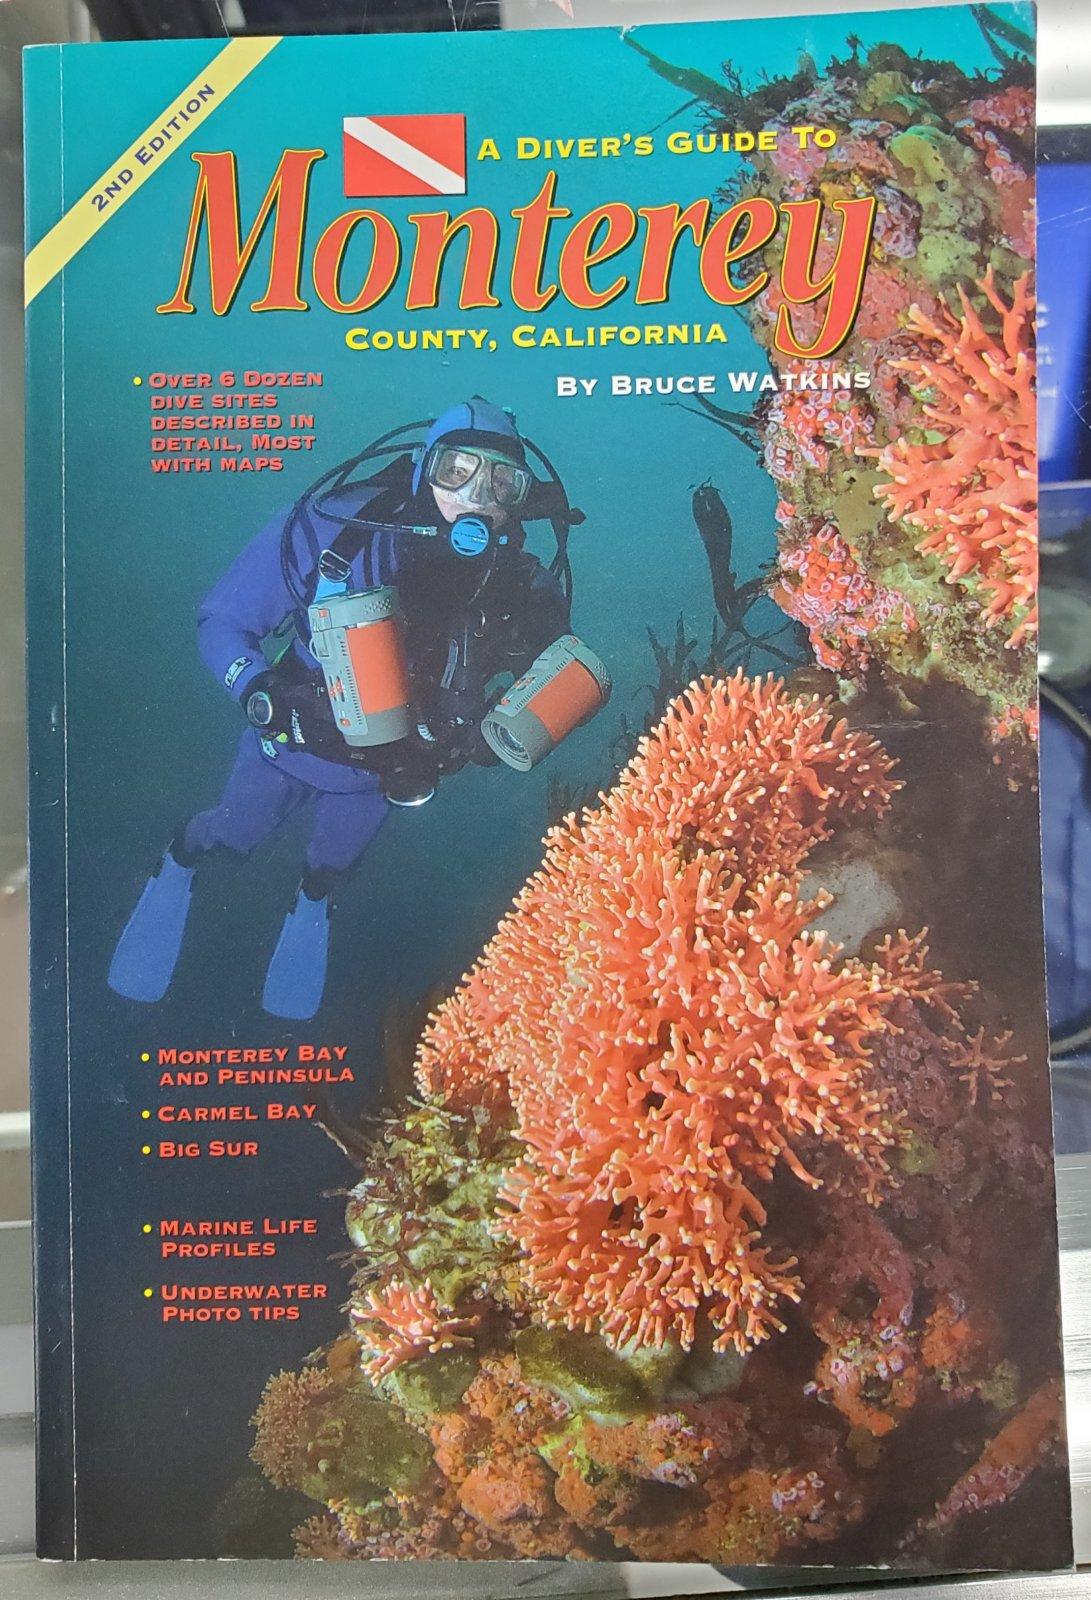 Monterey Diving Book by Bruce Watkins